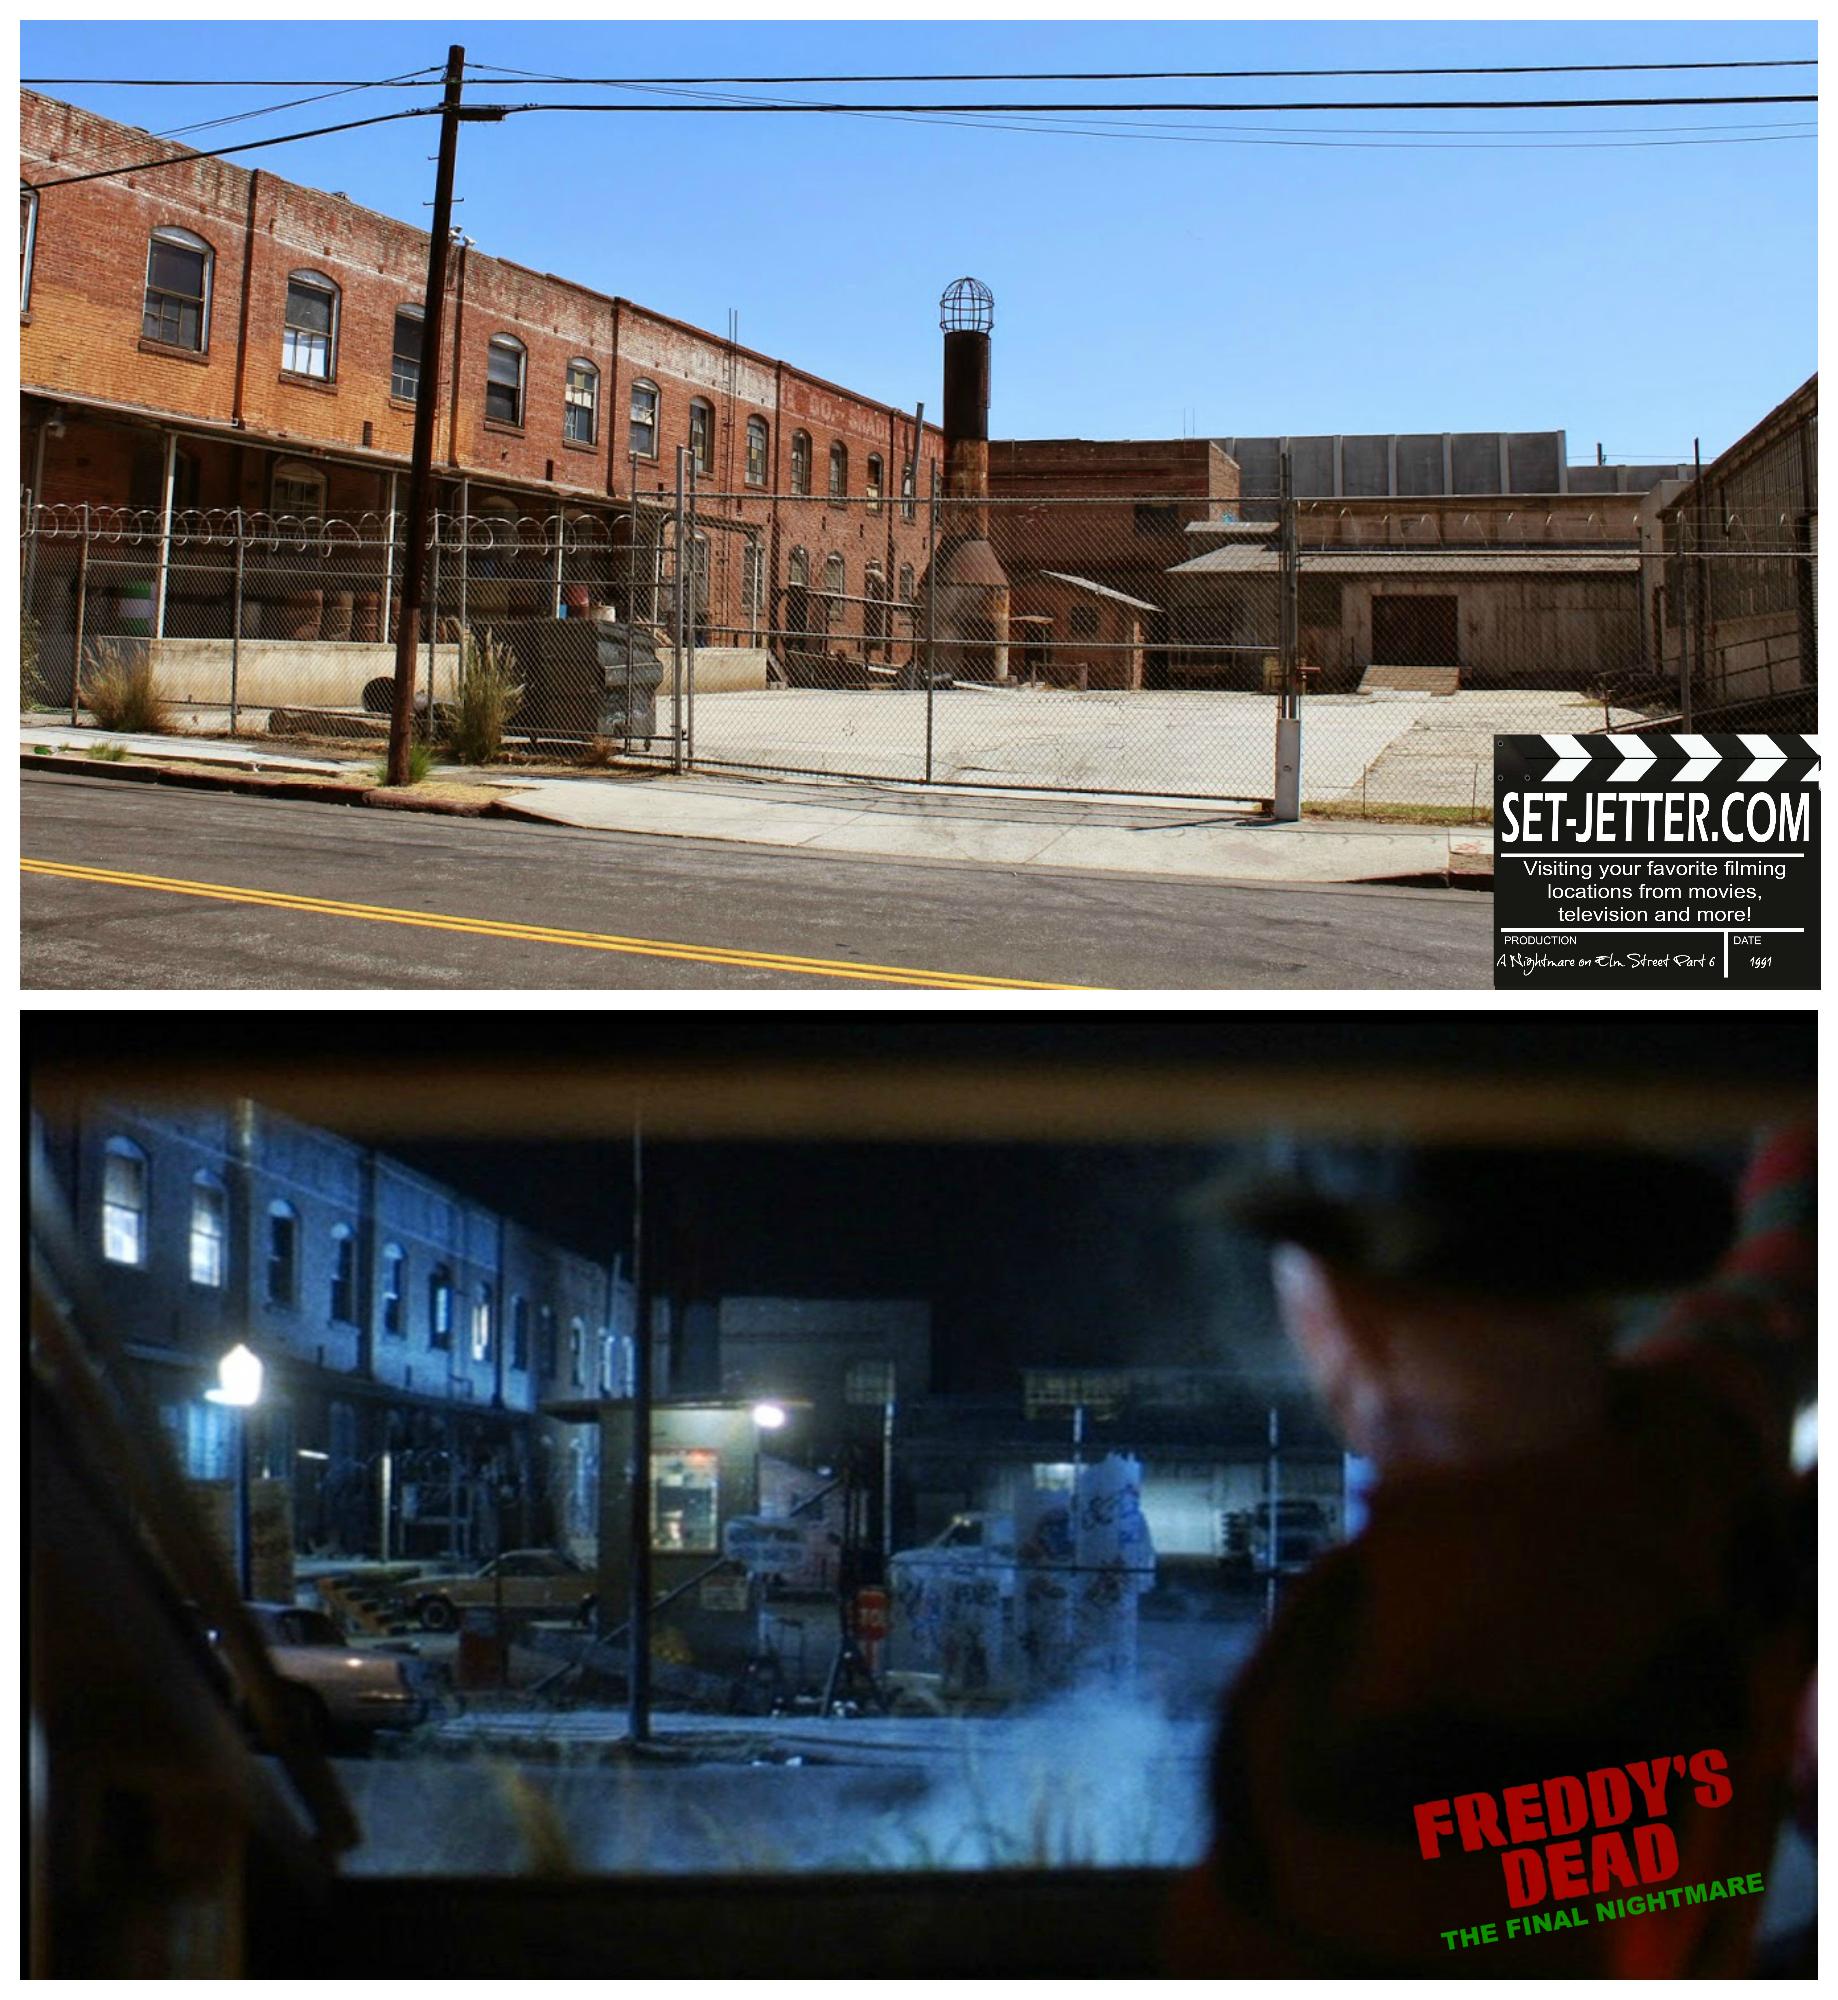 Nightmare on Elm Street Part 6 comparison 04.jpg